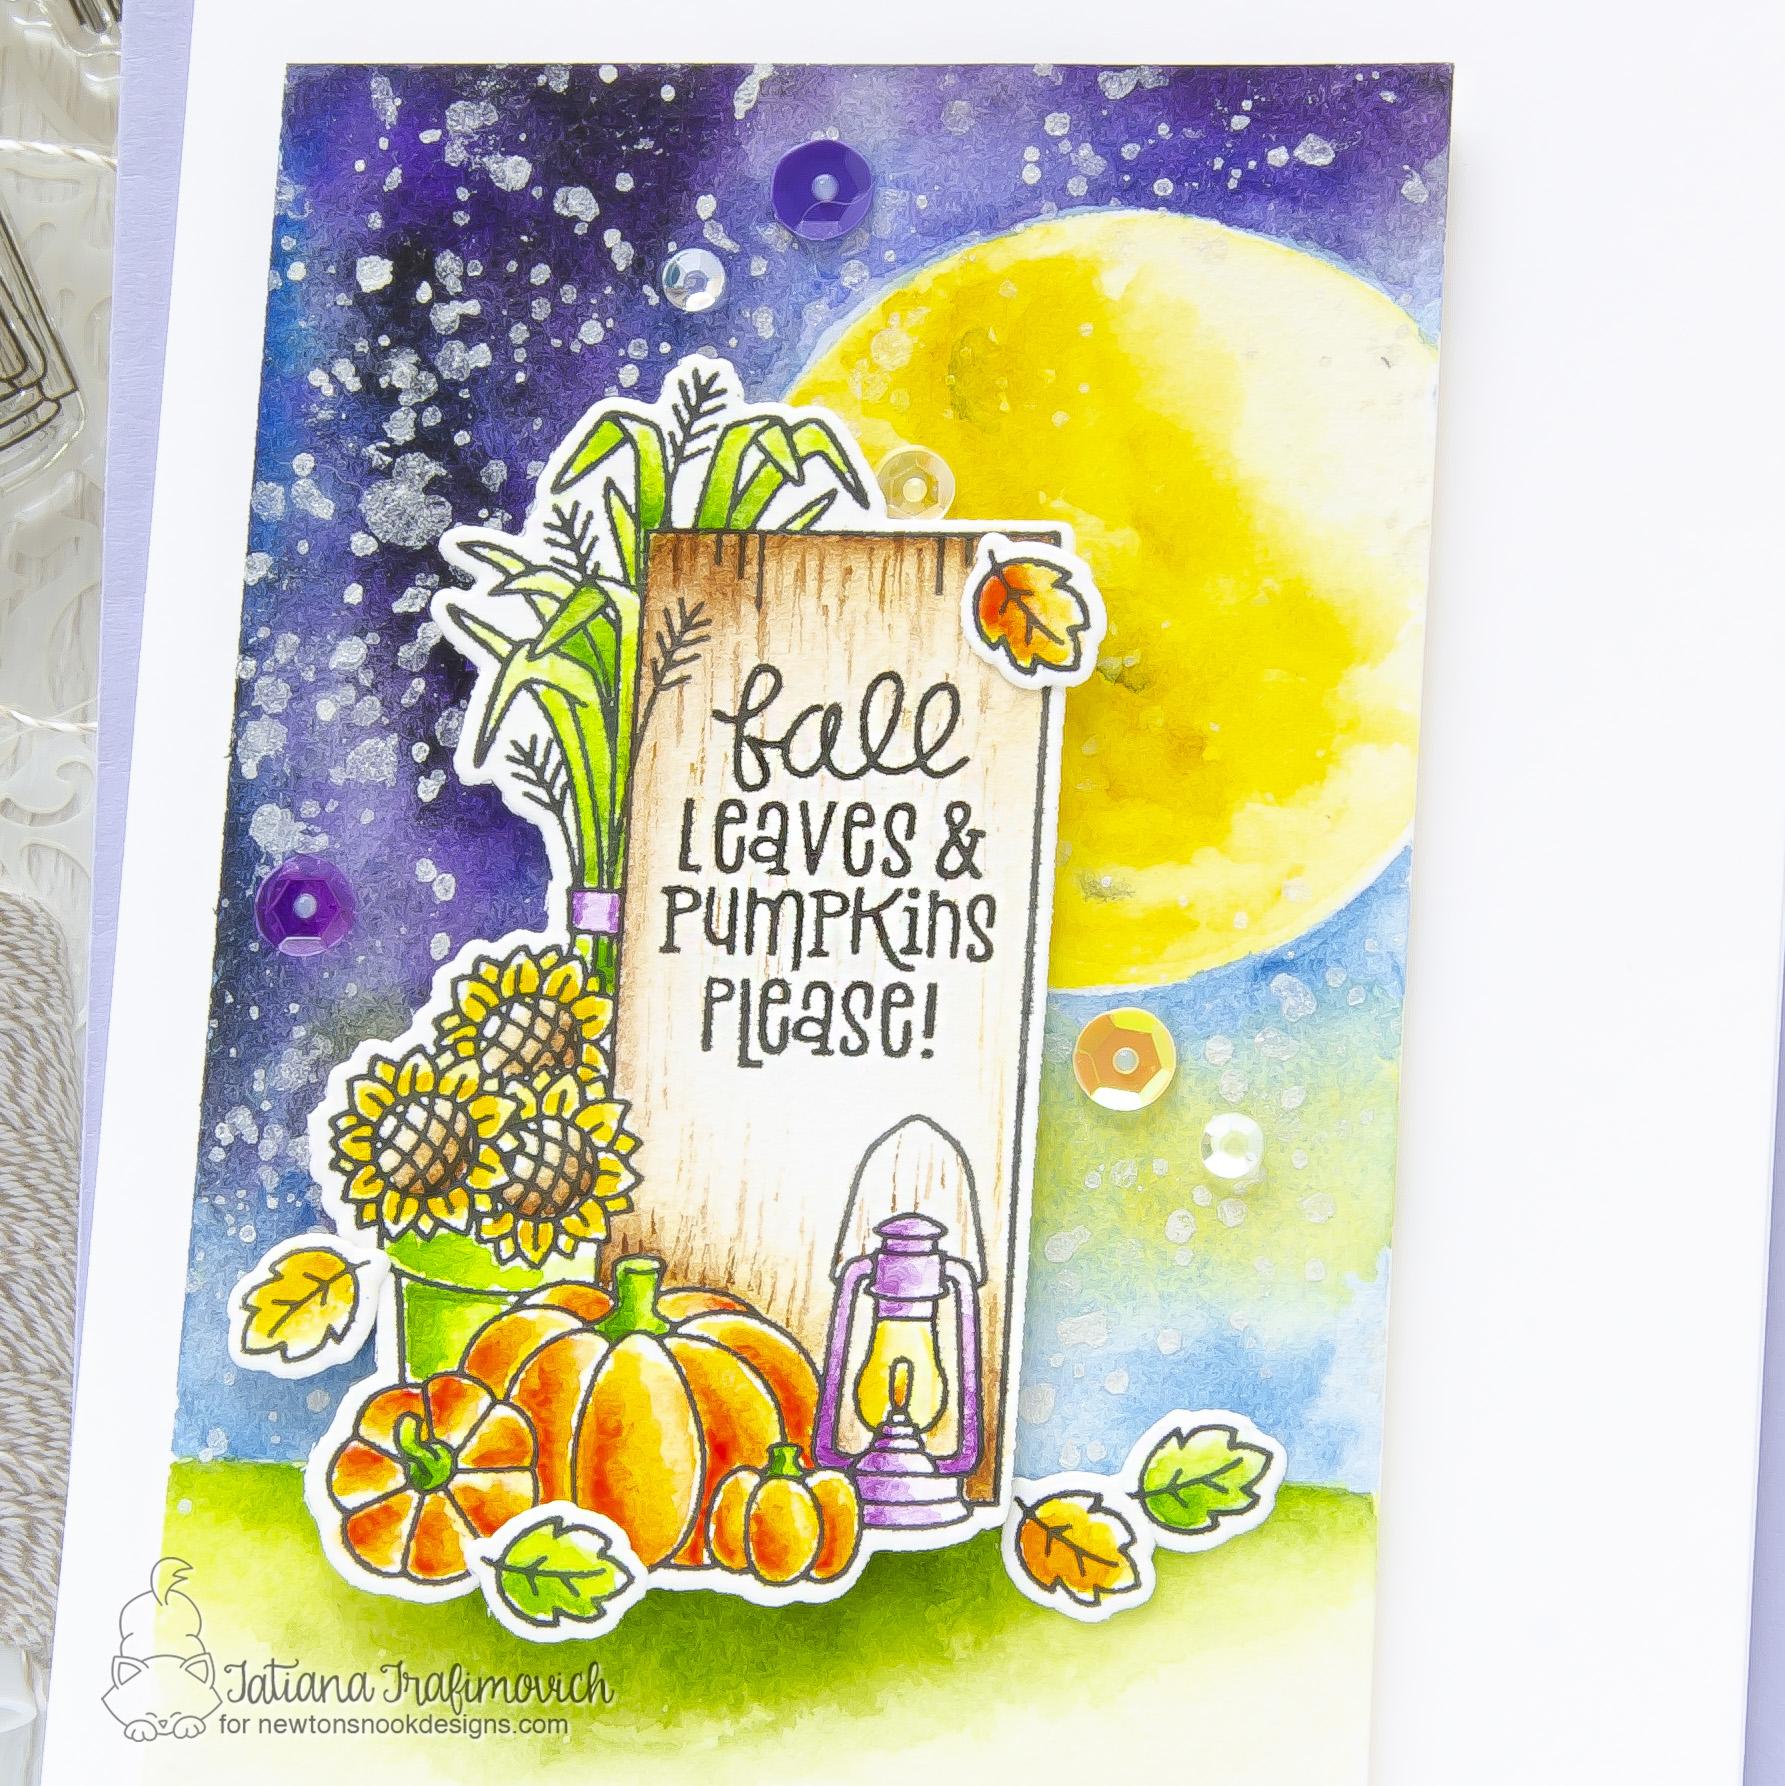 Fall Leaves & Pumpkins Please #handmade card by Tatiana Trafimovich #tatianacraftandart - Signs of Fall stamp set by Newton's Nook Designs #newtonsnook